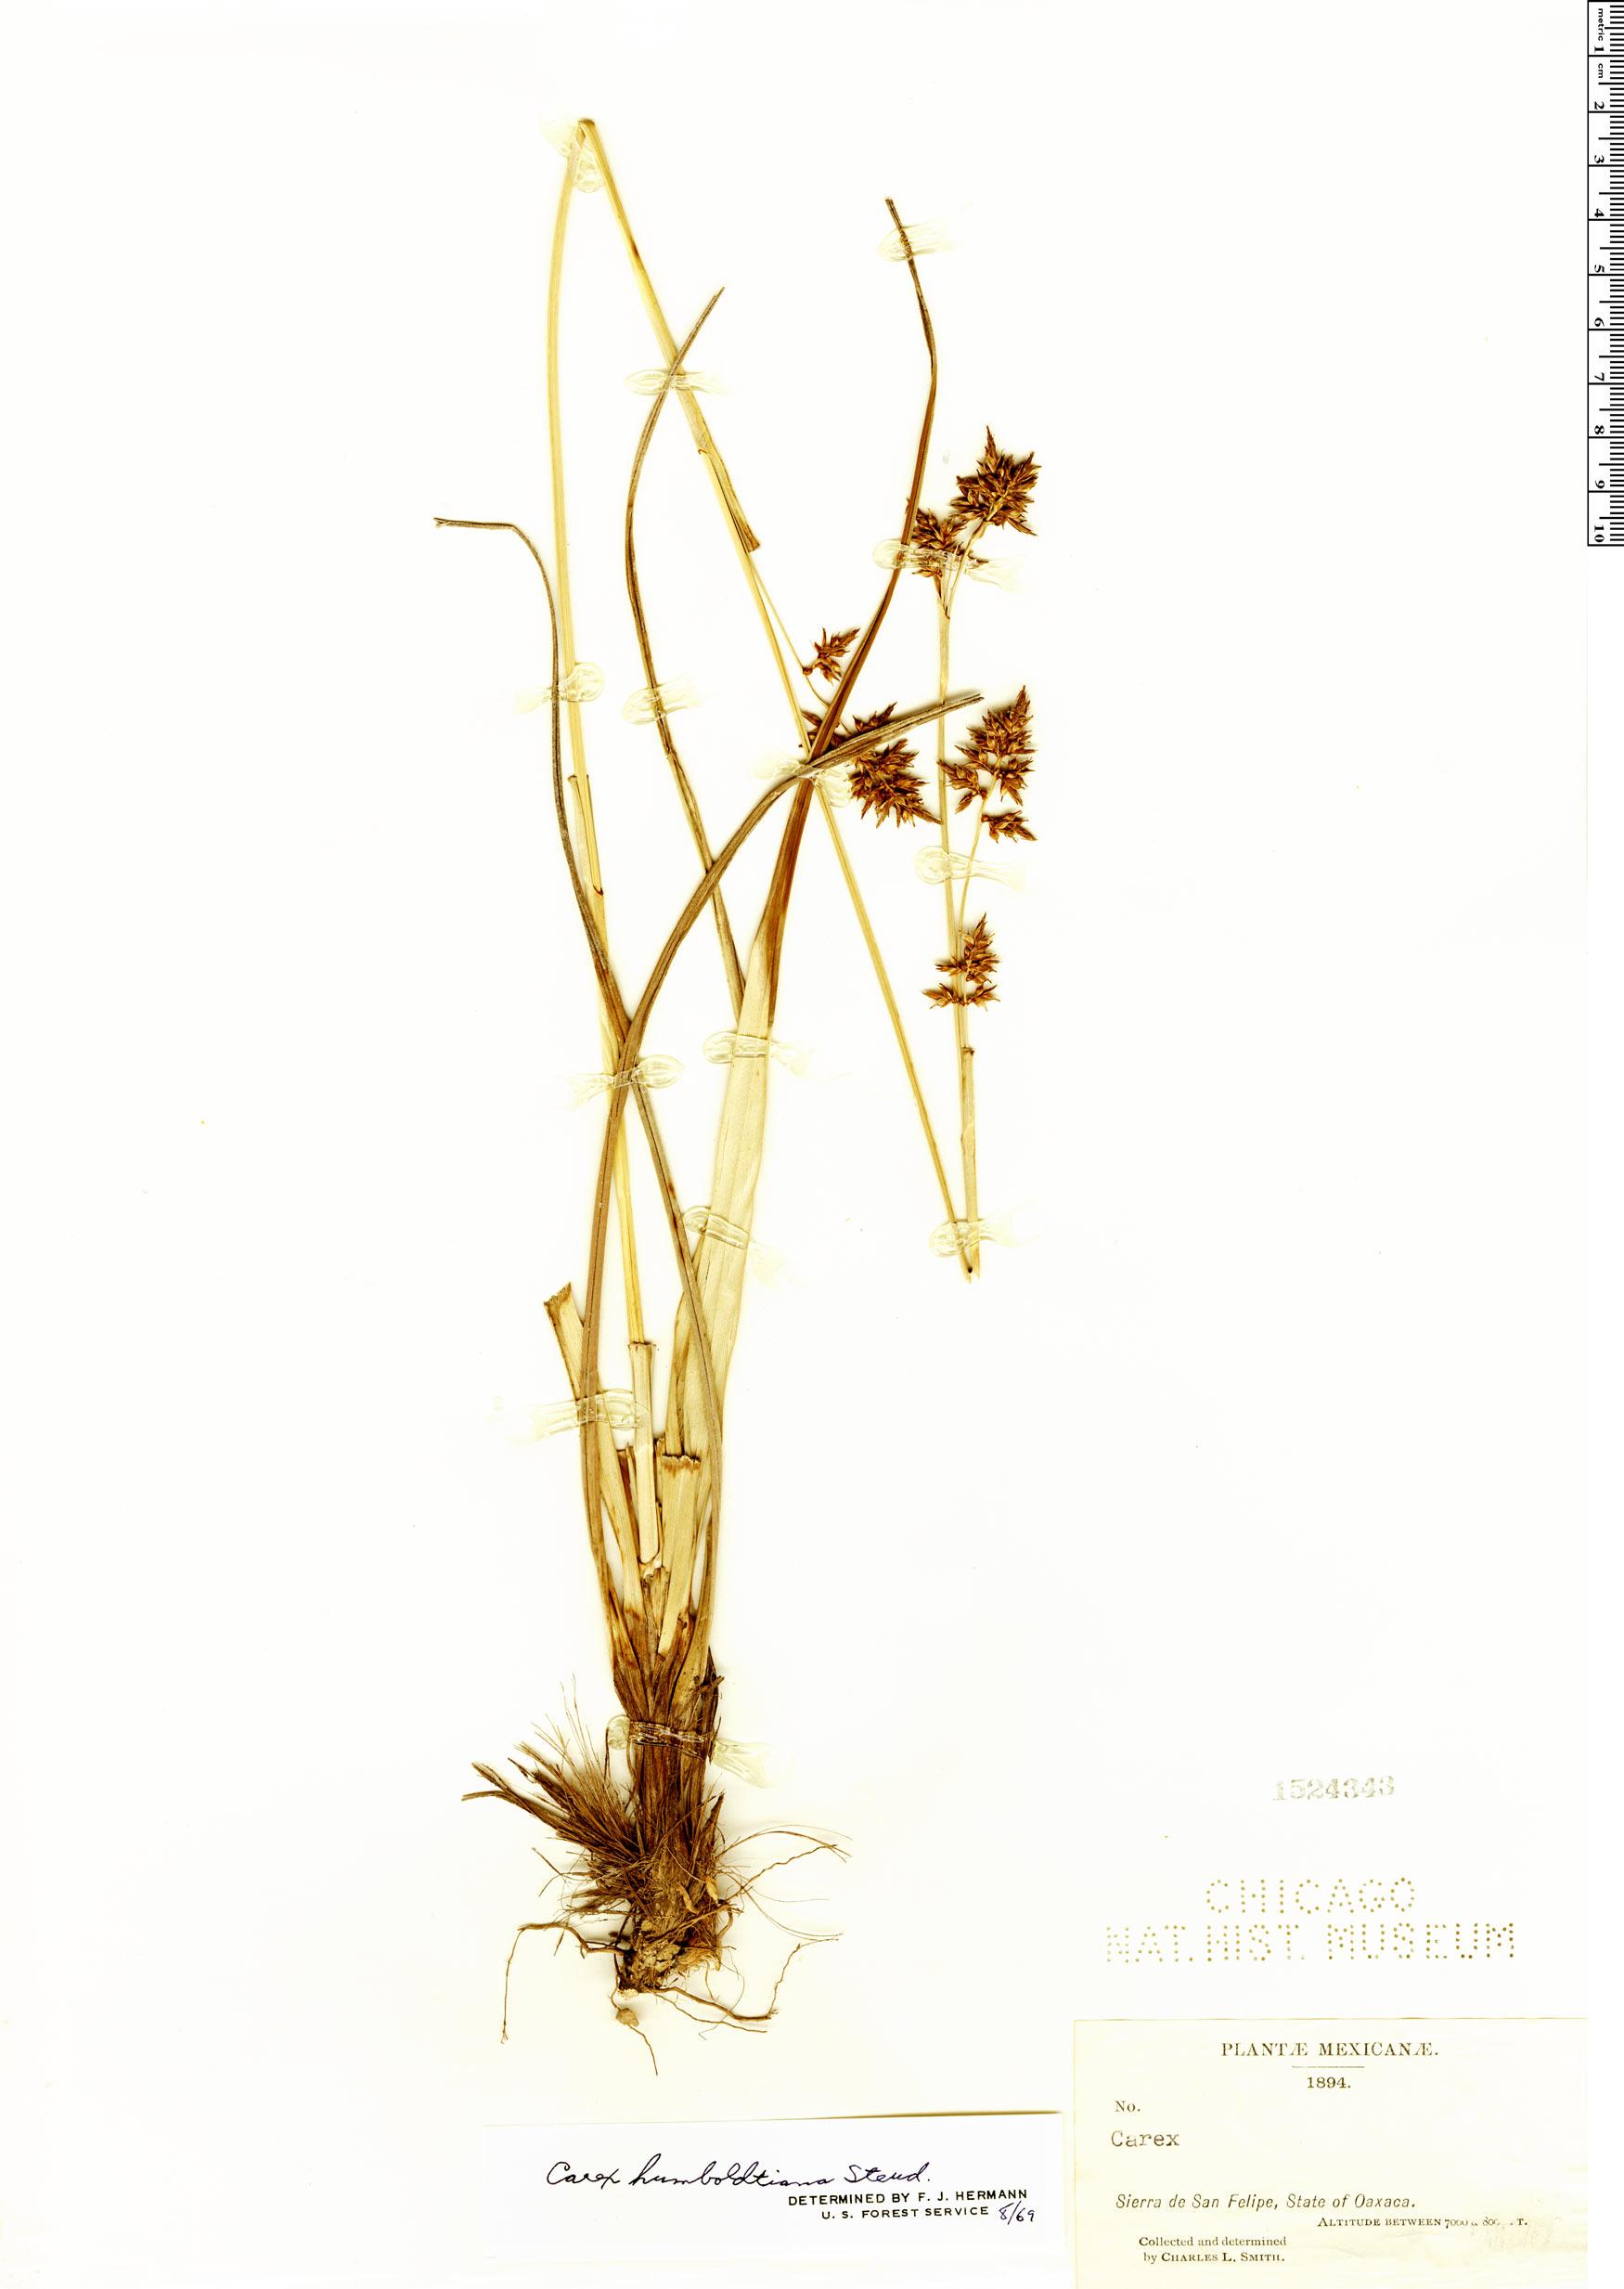 Specimen: Carex humboldtiana